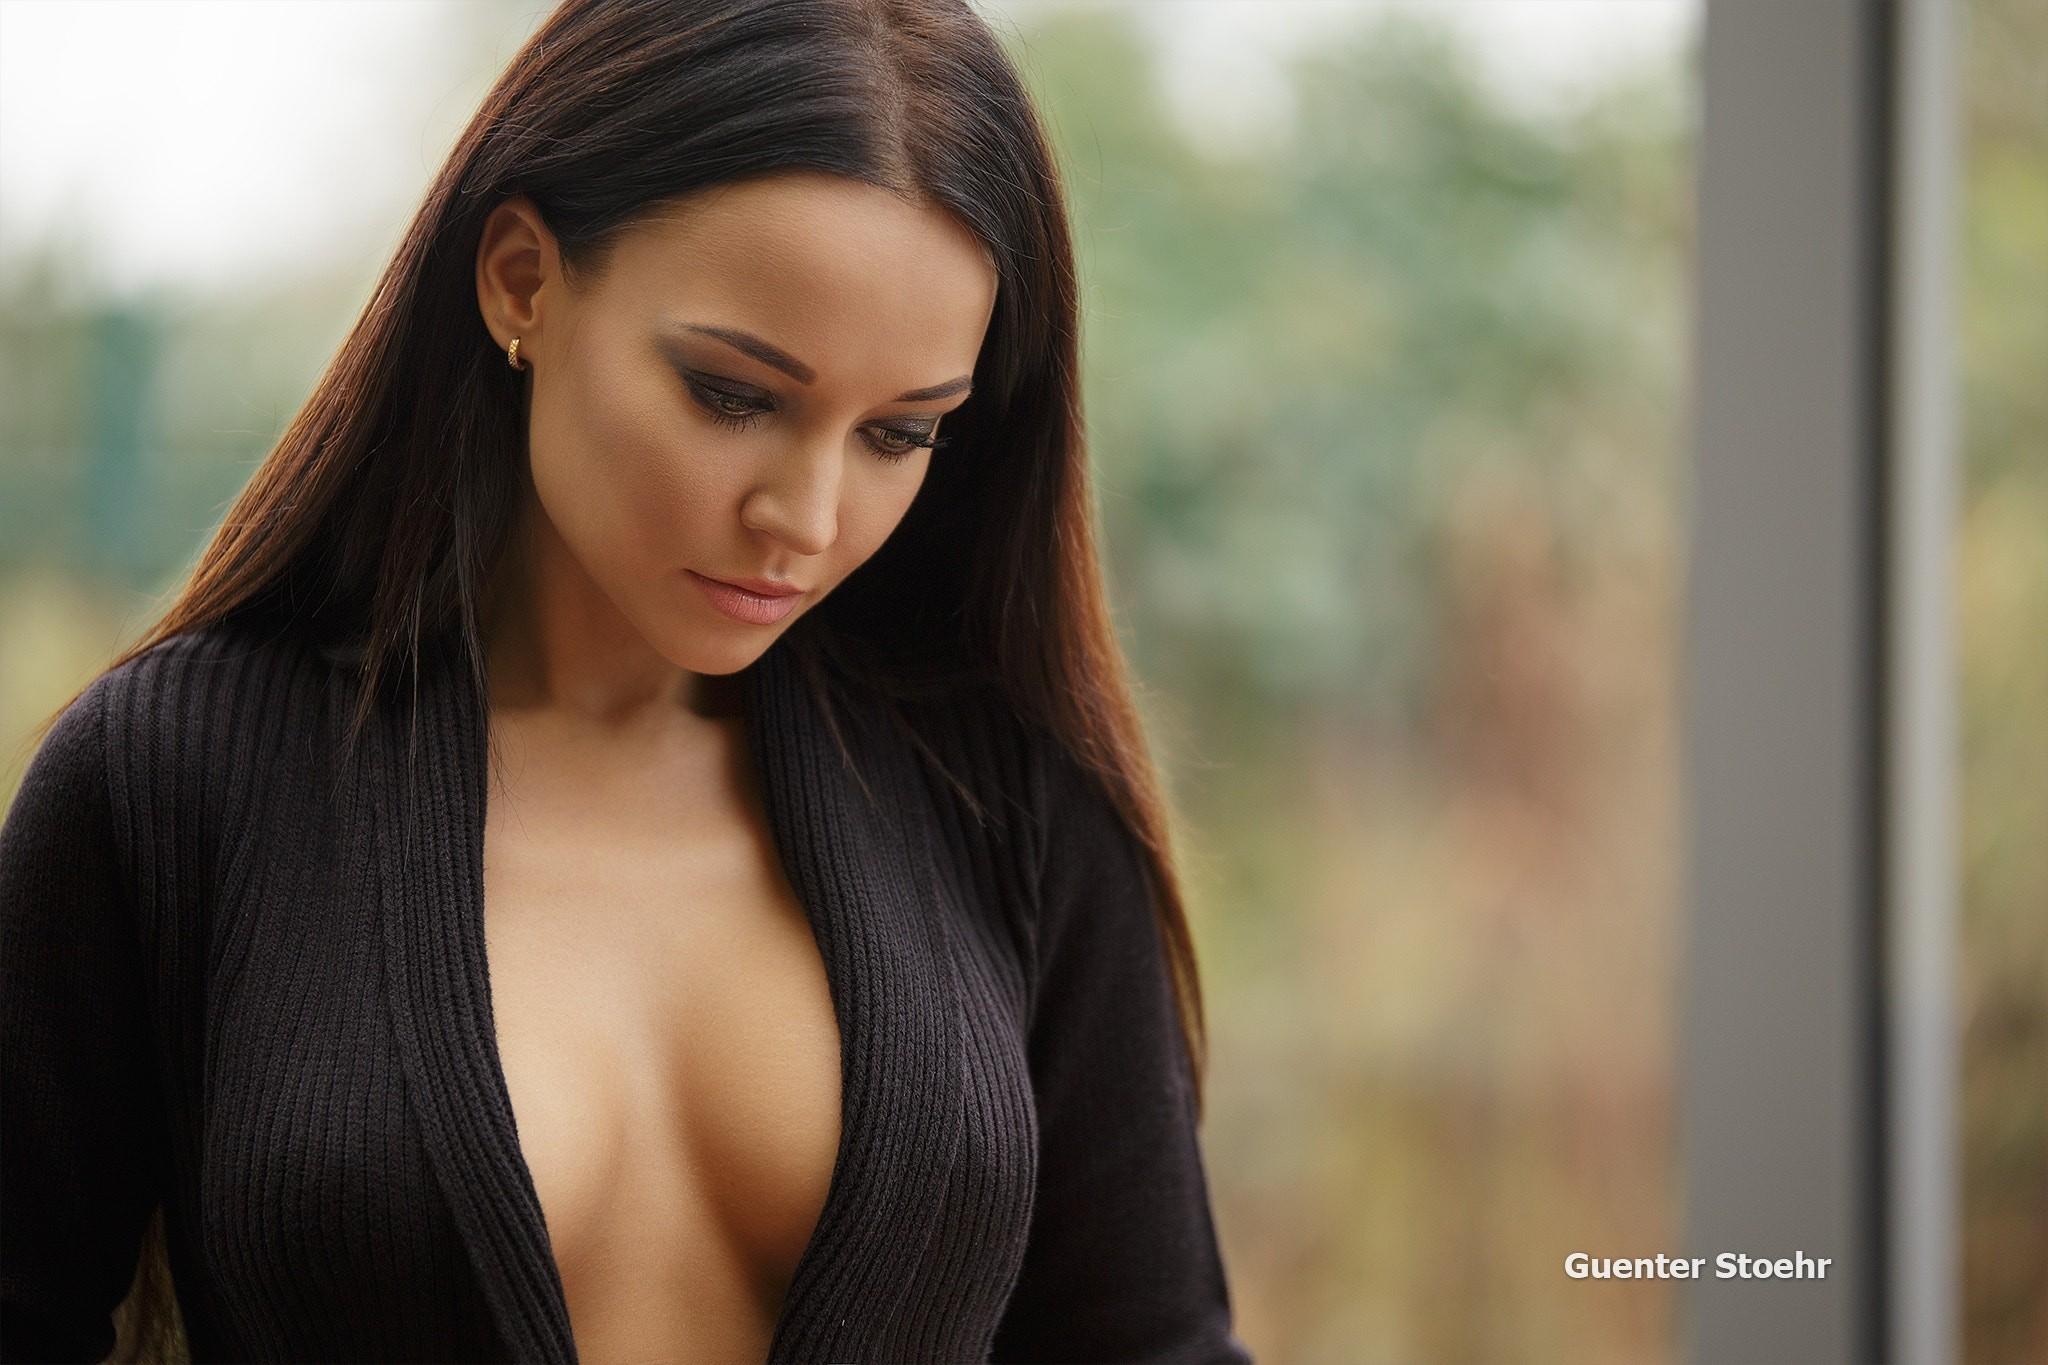 People 2048x1365 Angelina Petrova women model Guenter Stoehr portrait depth of field brunette black clothing long hair